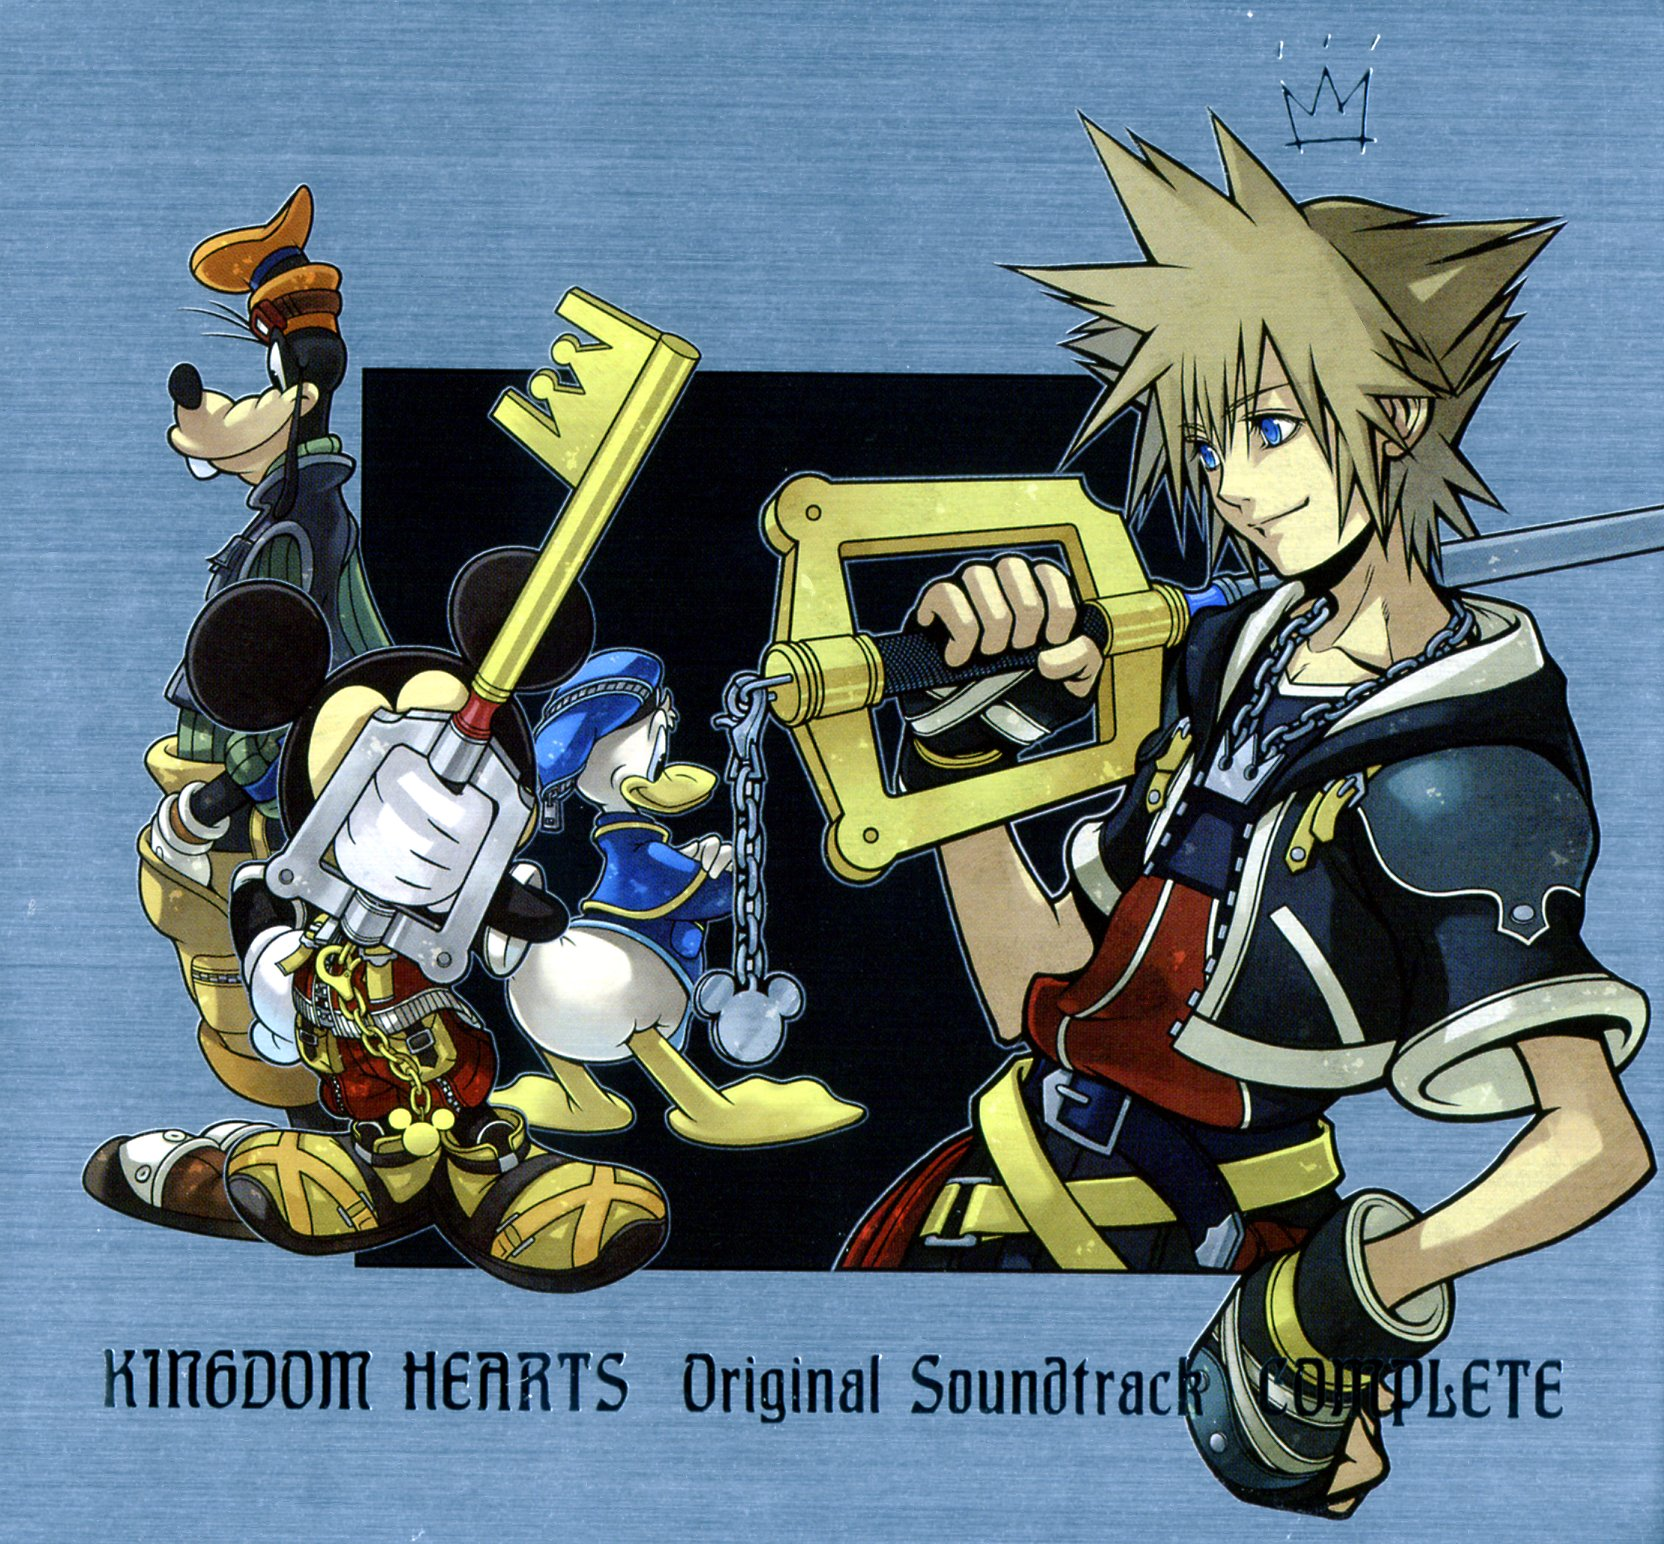 Kingdom Hearts Original Soundtrack Complete